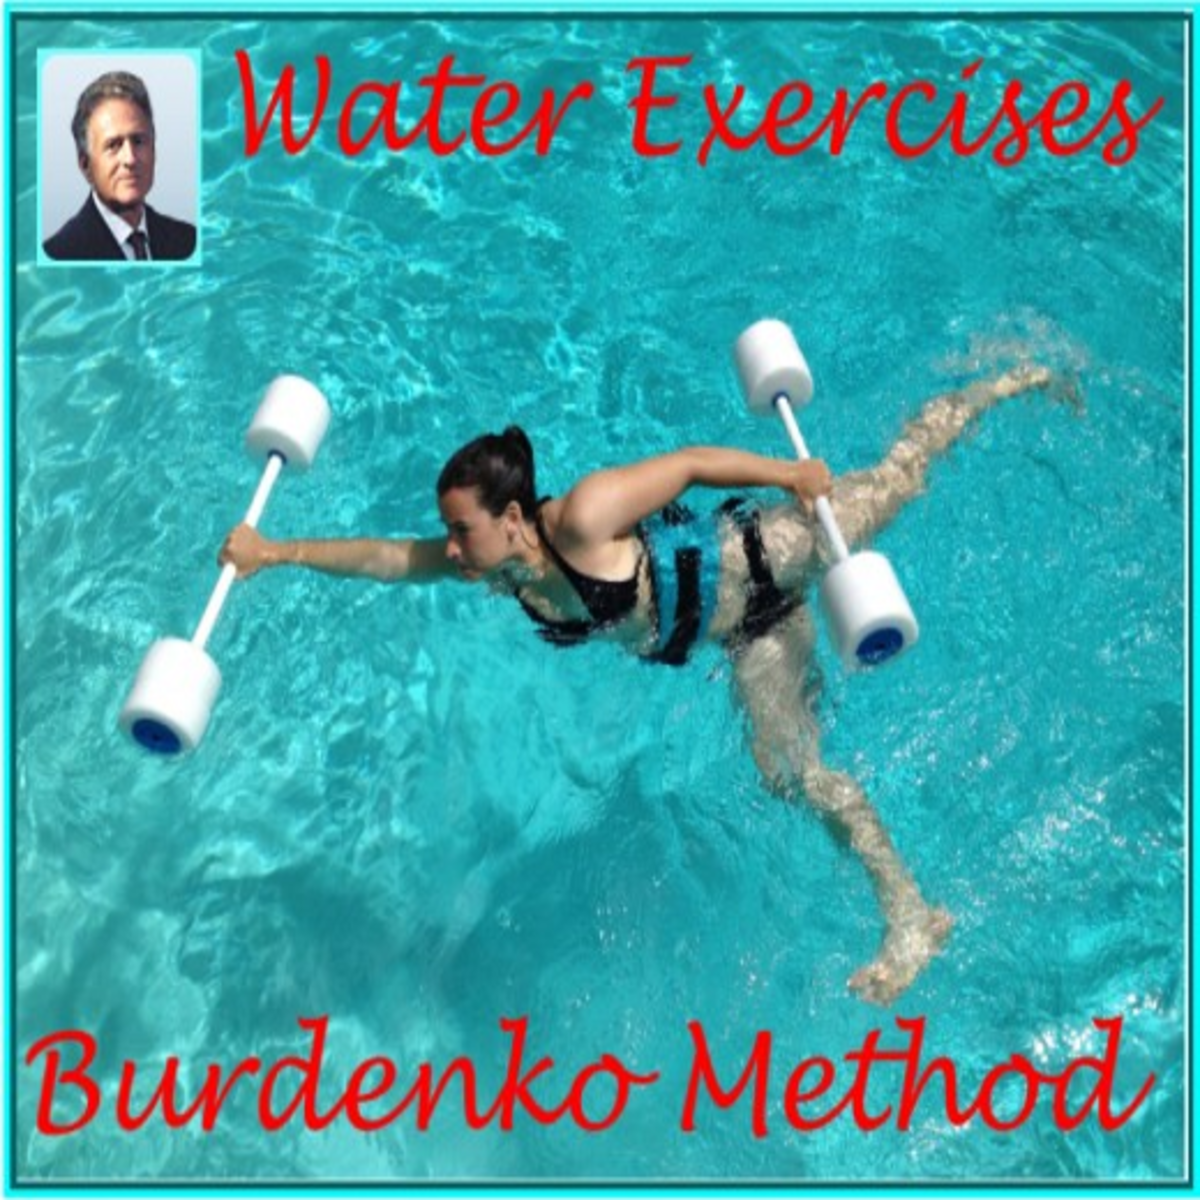 Water Exercises With the Burdenko Method